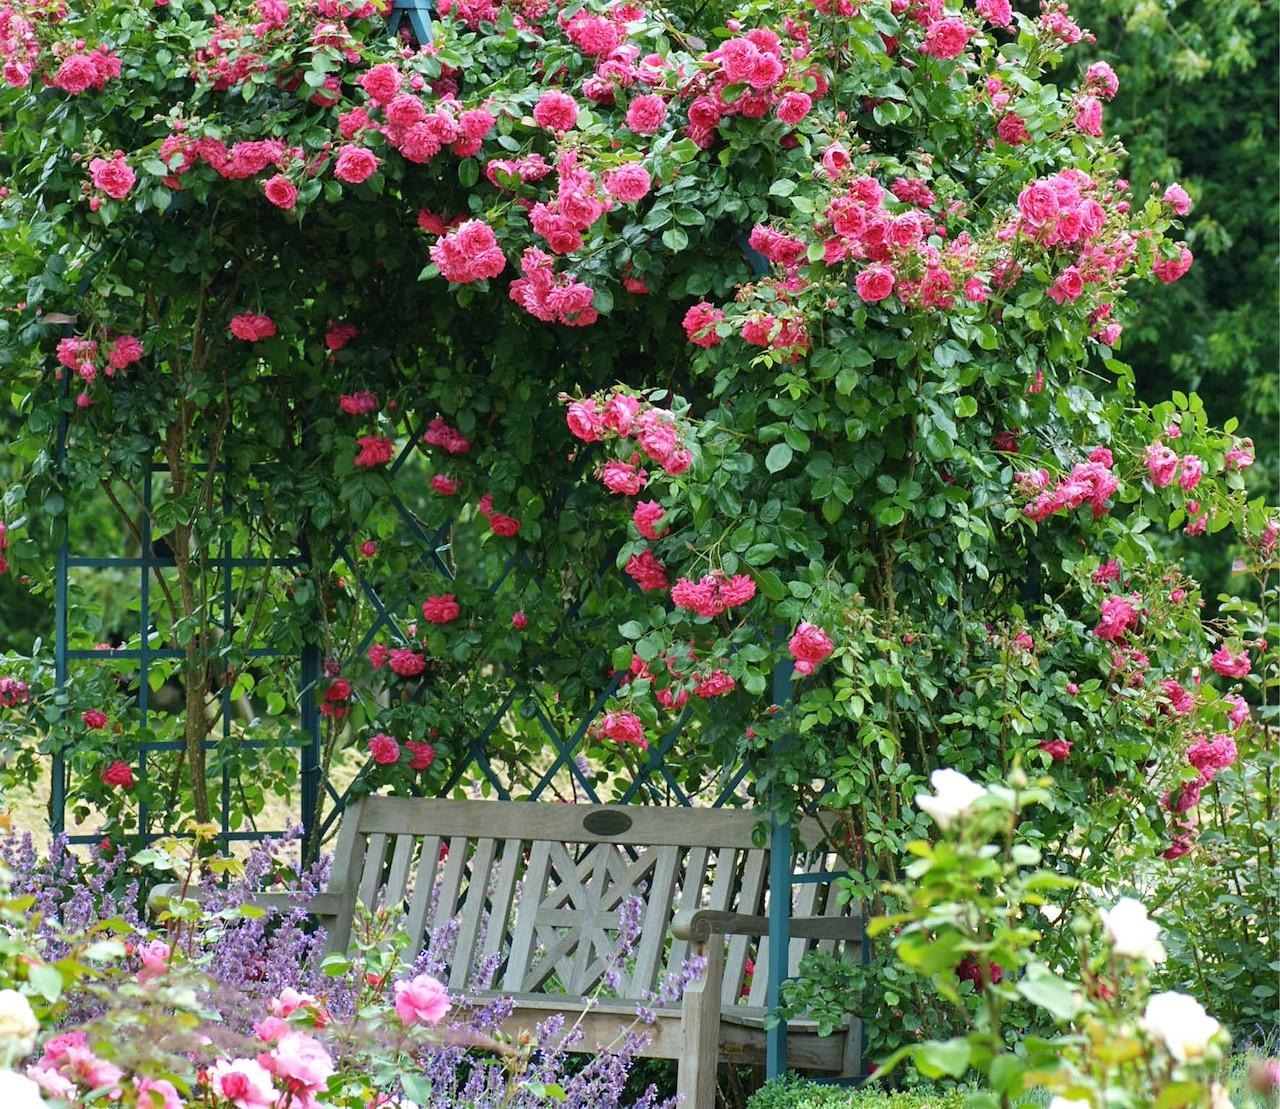 Fleur je tuin op, met klimrozen